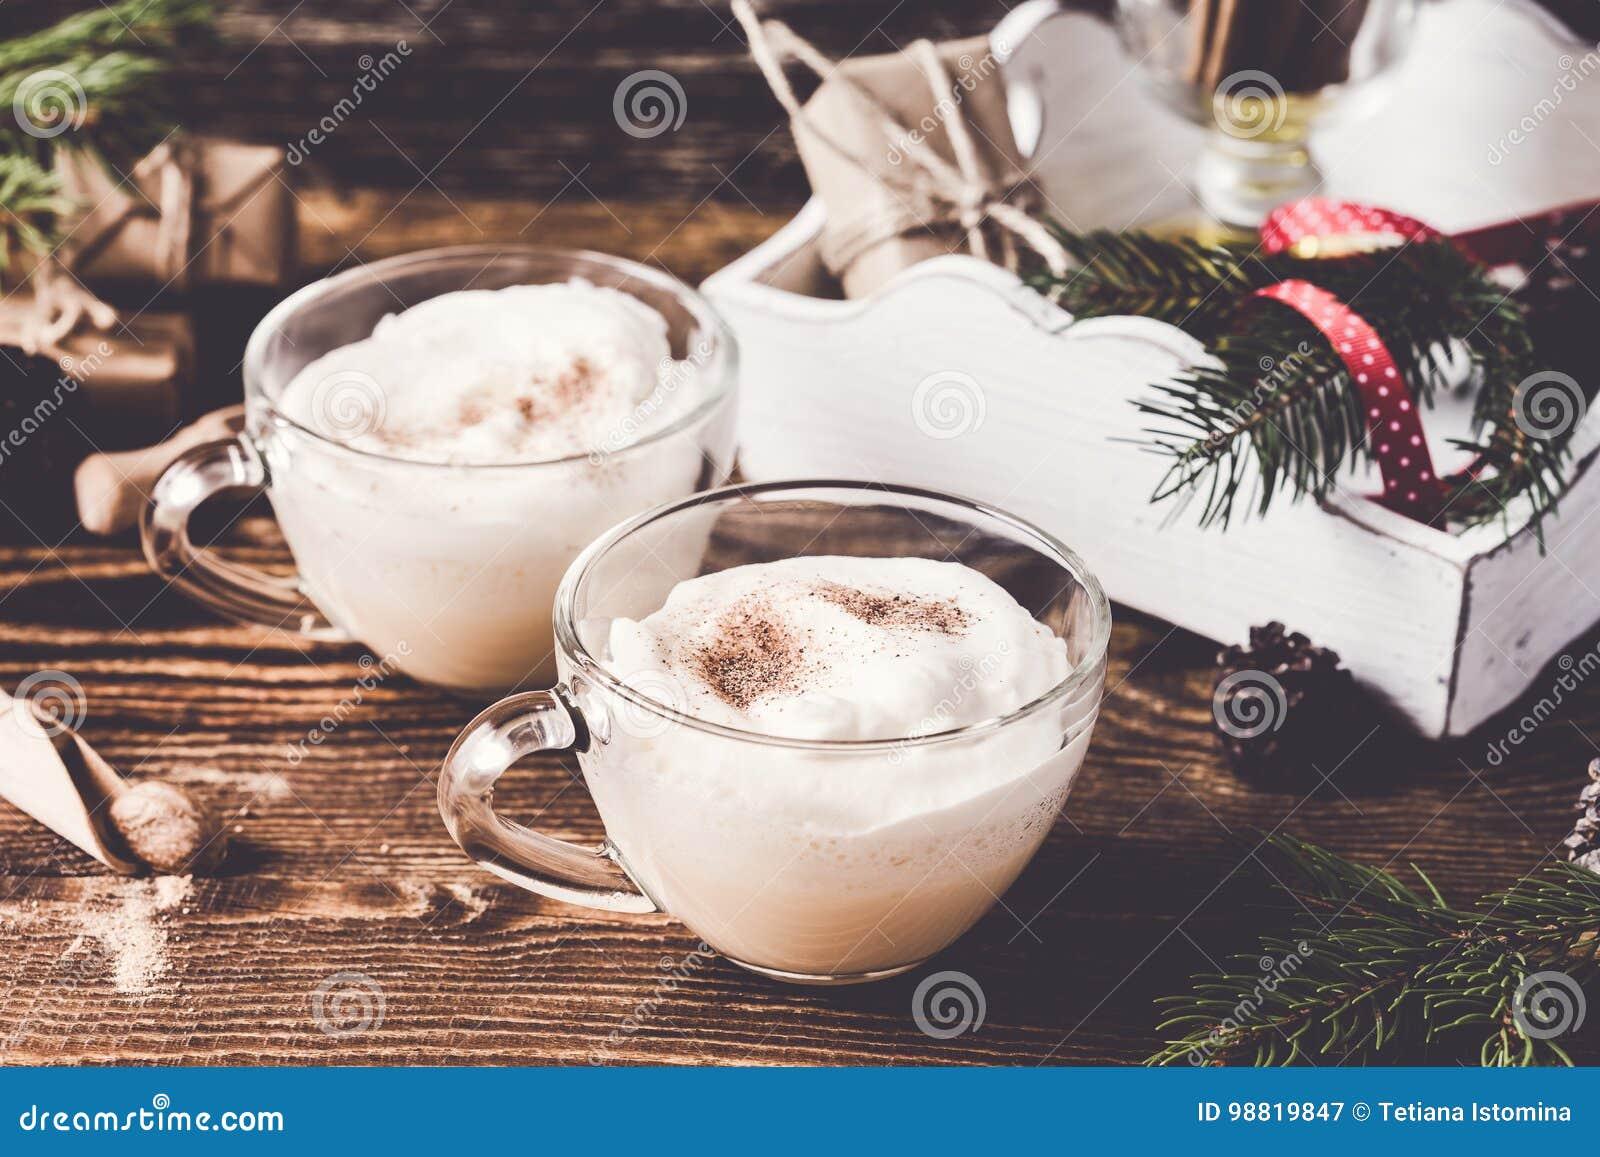 Christmas holiday spicy milkshakes drink